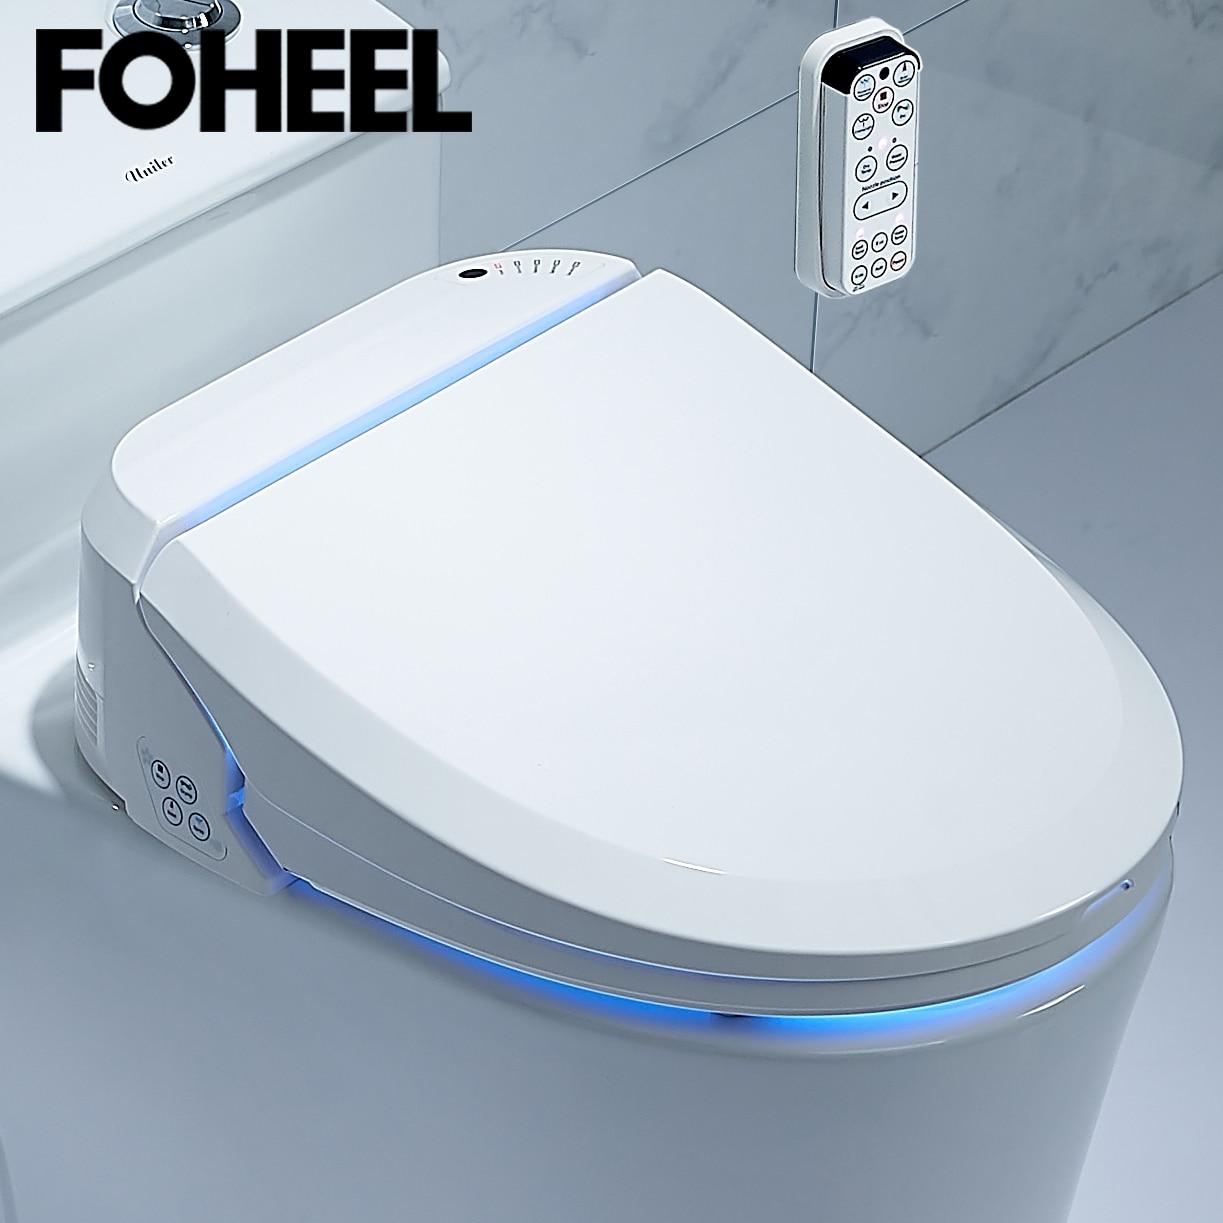 FOHEEL Smart Toilet Seat Electric Bidet Cover Intelligent Bidet Heat Clean Dry Massage Intelligent Toilet Seat